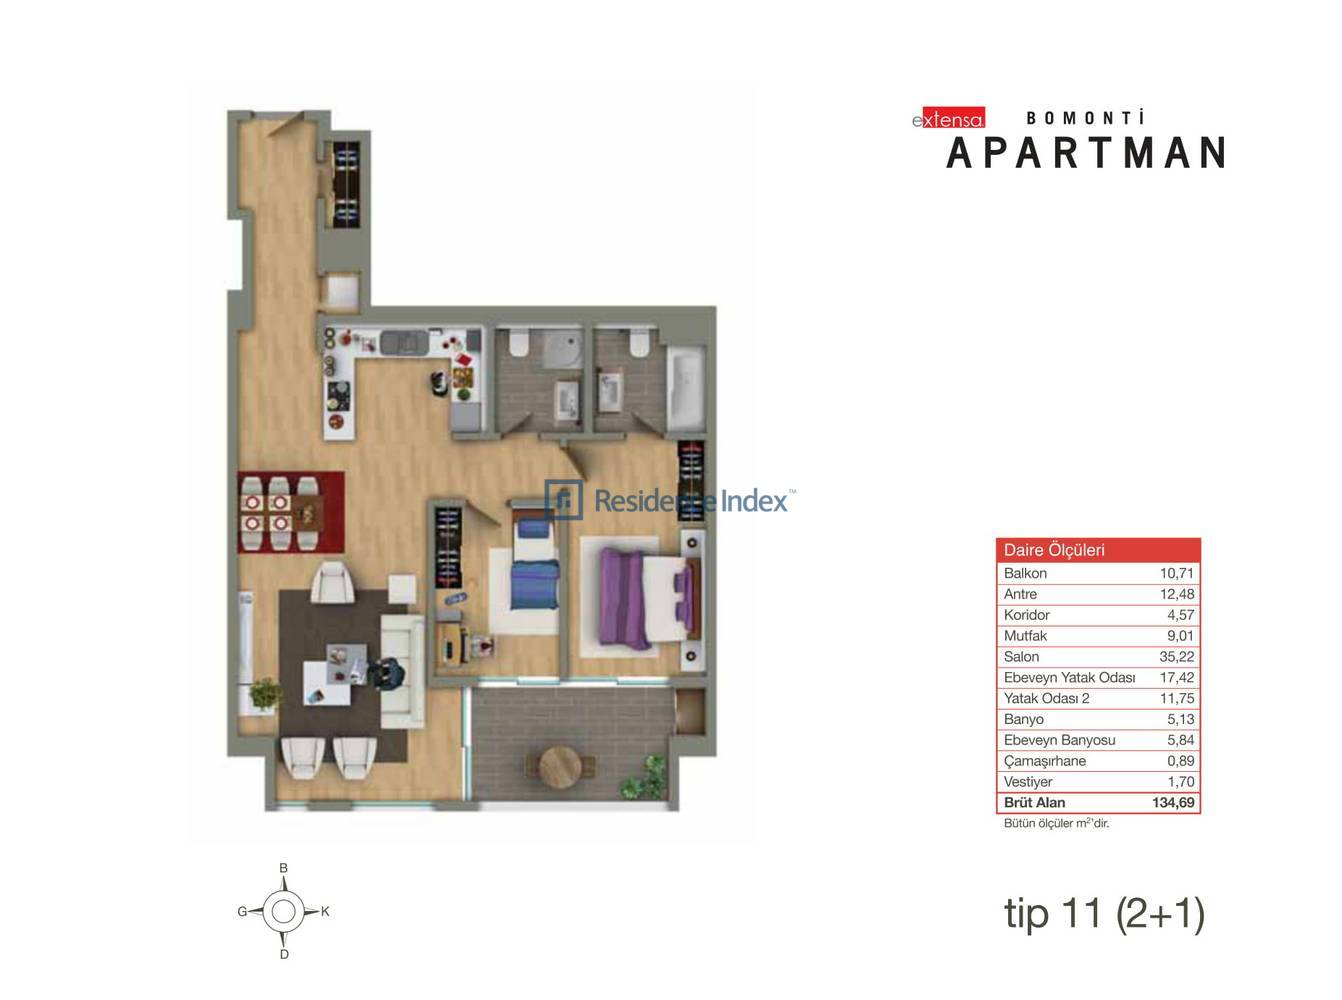 Bomonti Apartmanı Tip 11